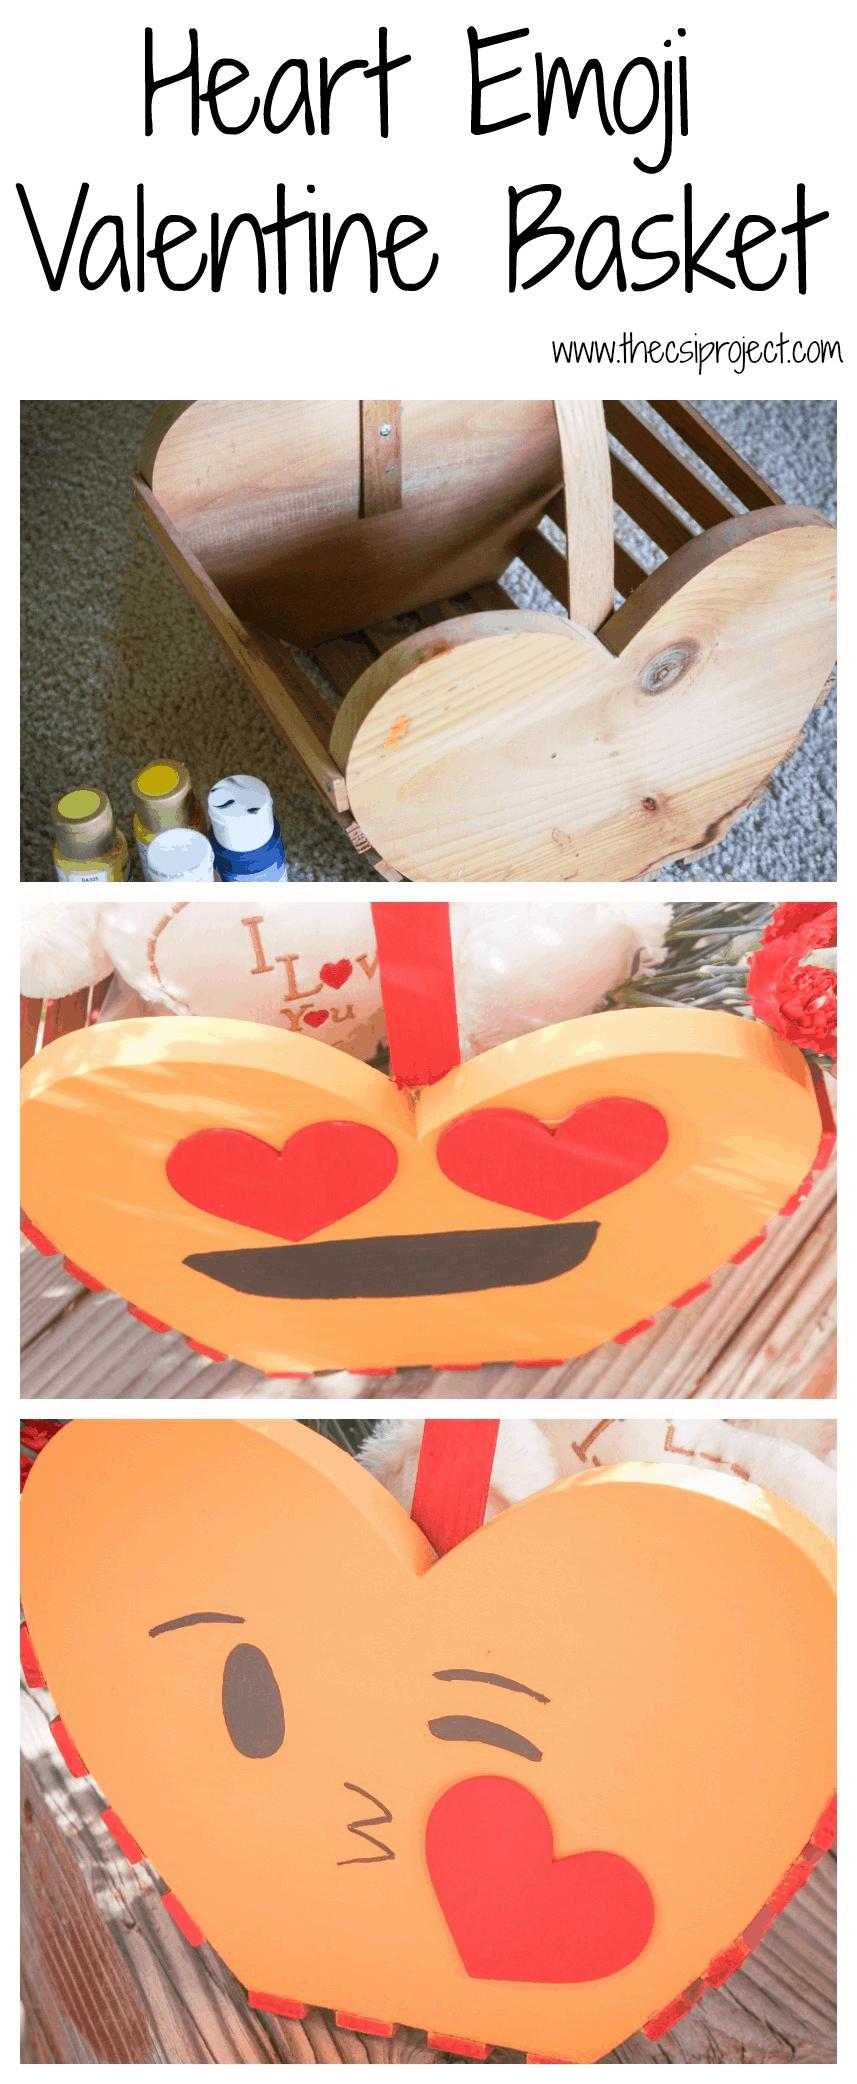 Heart Emoji Valentine Basket